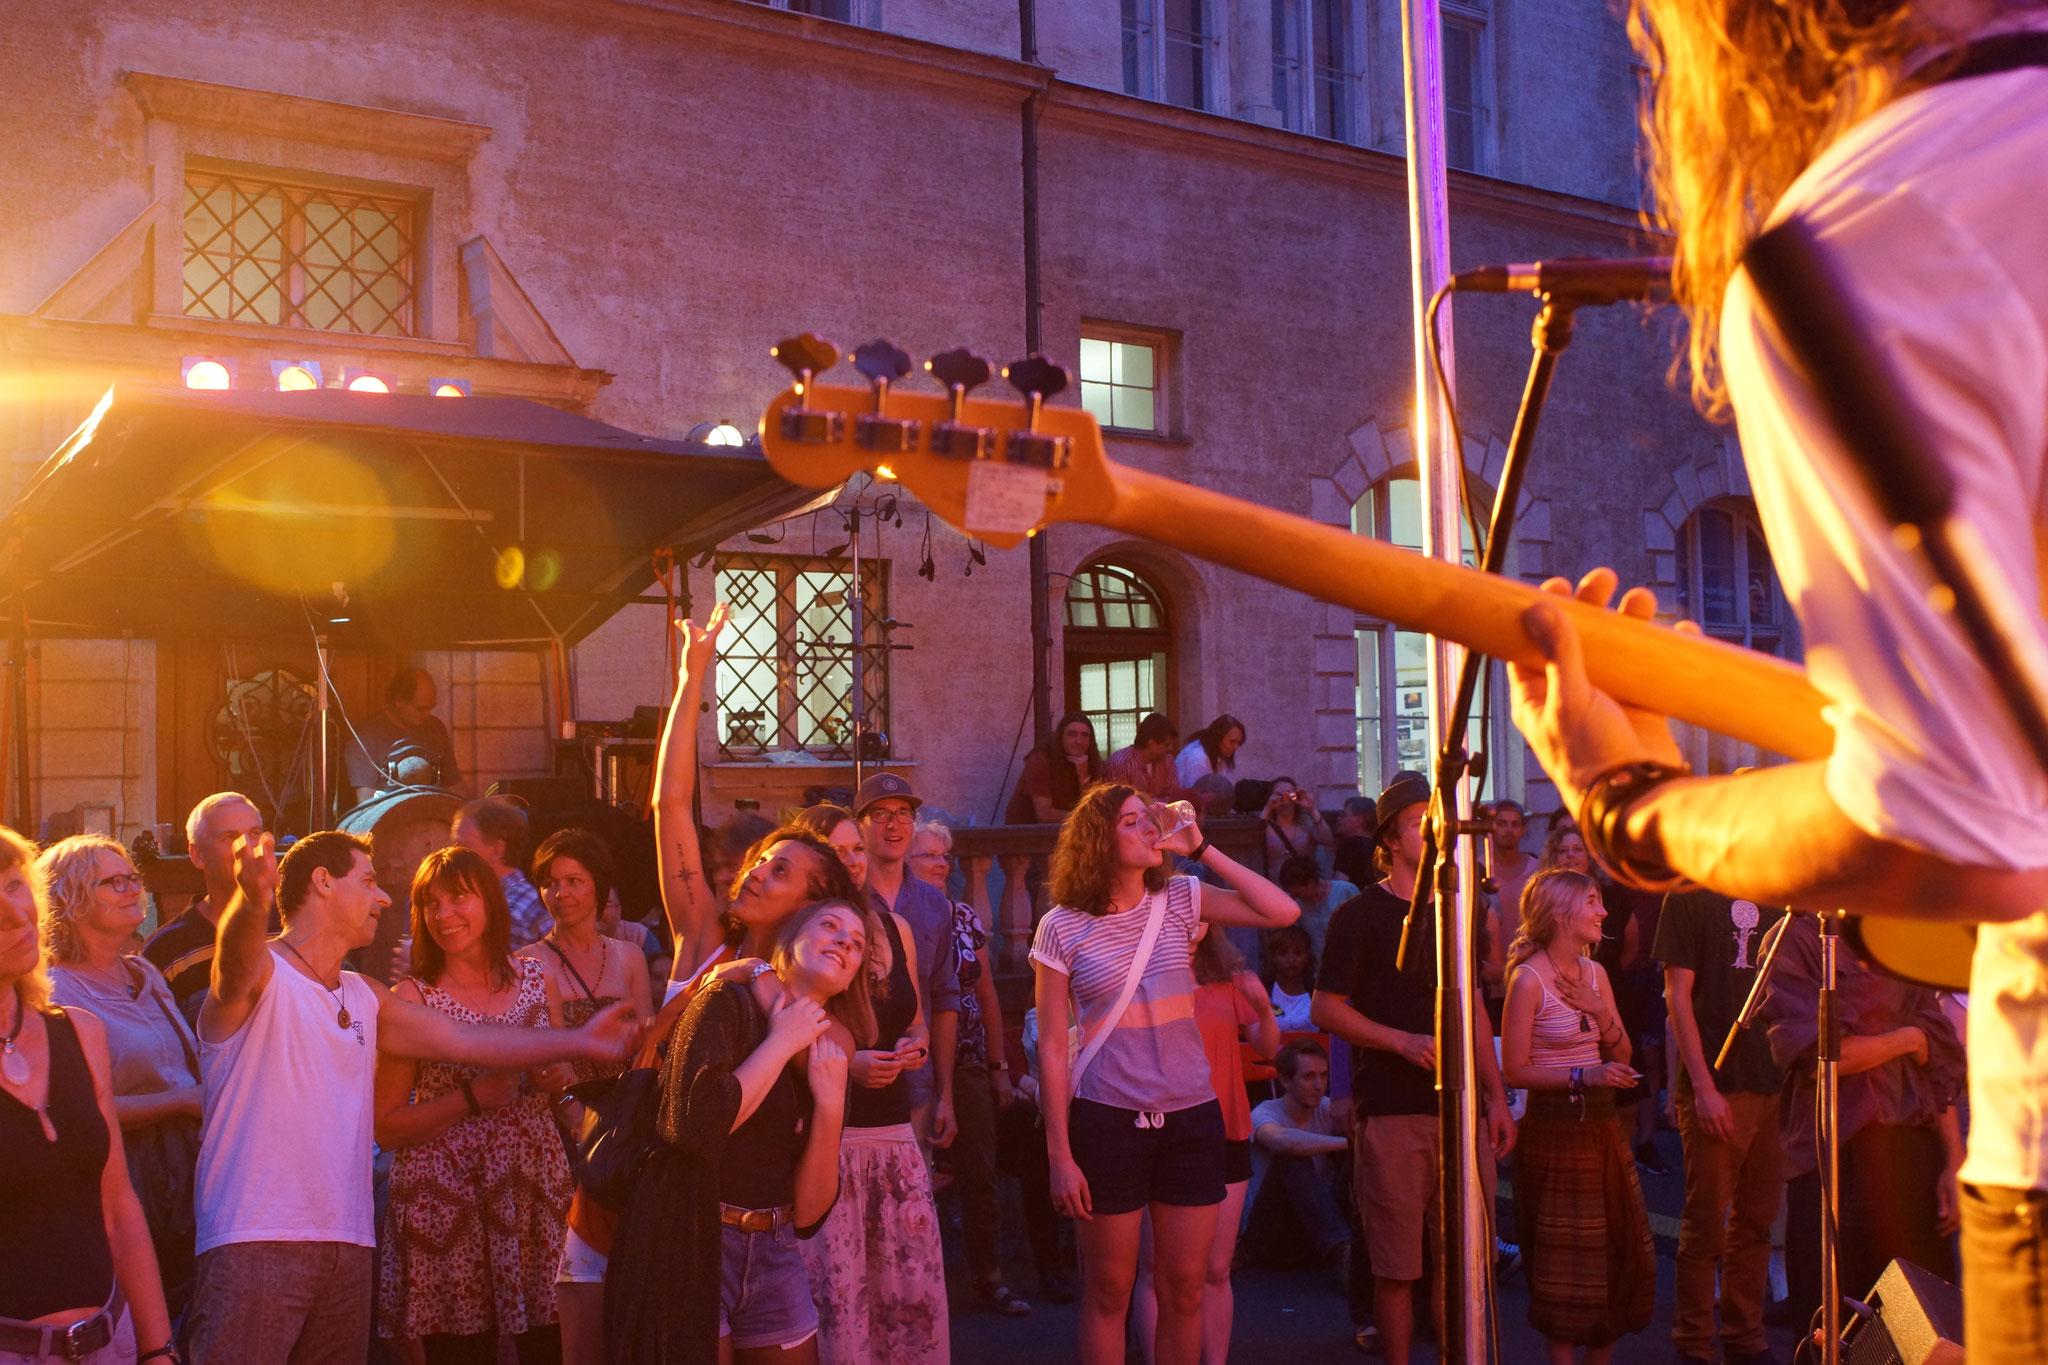 Konzerte im Bürgerhof 09.07.16 Pinewood Soul - Freiwilligen-Zentrum Augsburg - Foto: Crayfish